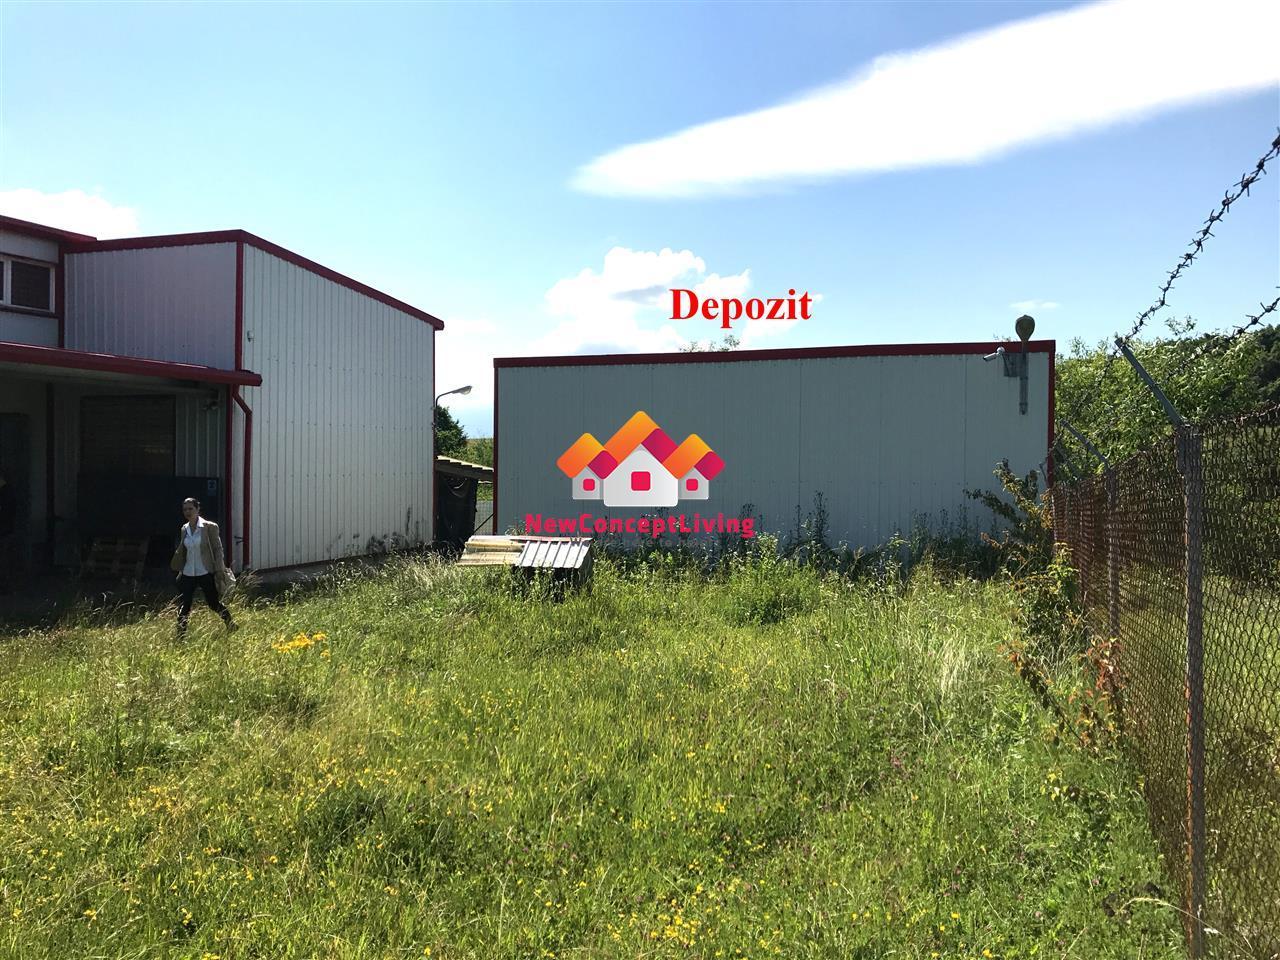 Spatiu comercial finalizat, pretabil productie sau comercial